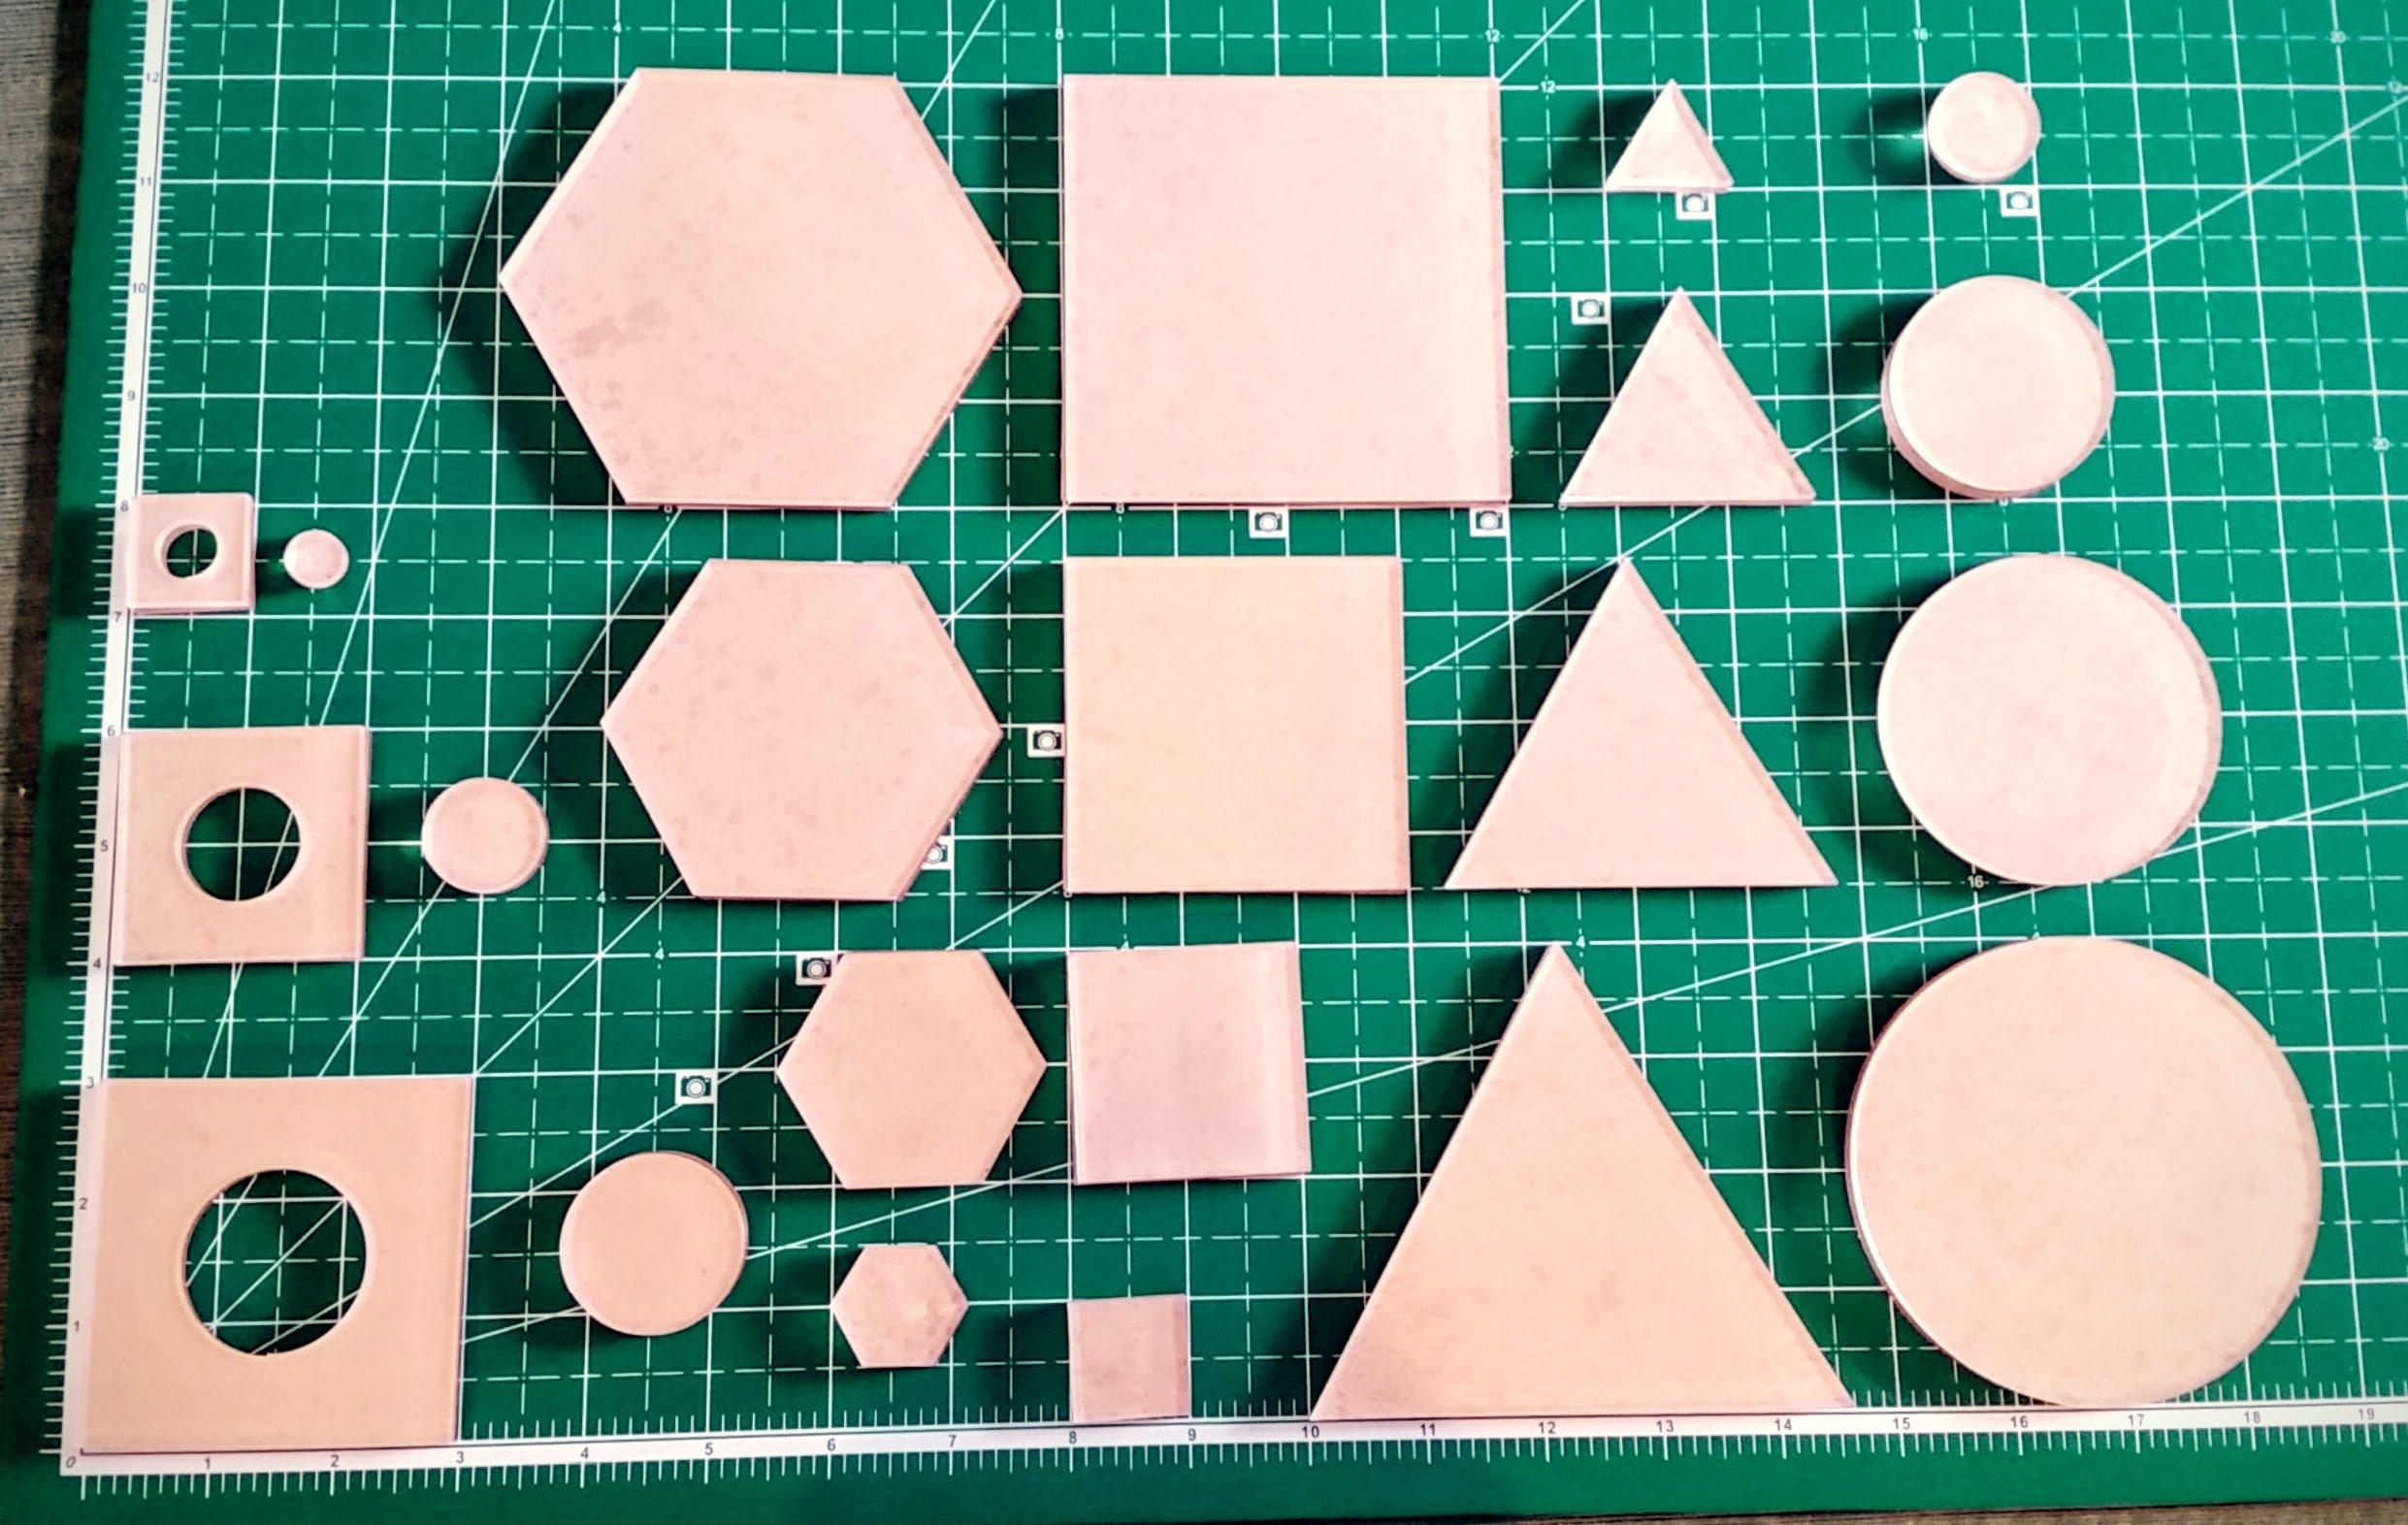 Itajime Shibori Templates - 44 piece set - Square, Circle, Hexagon, and Twinkle